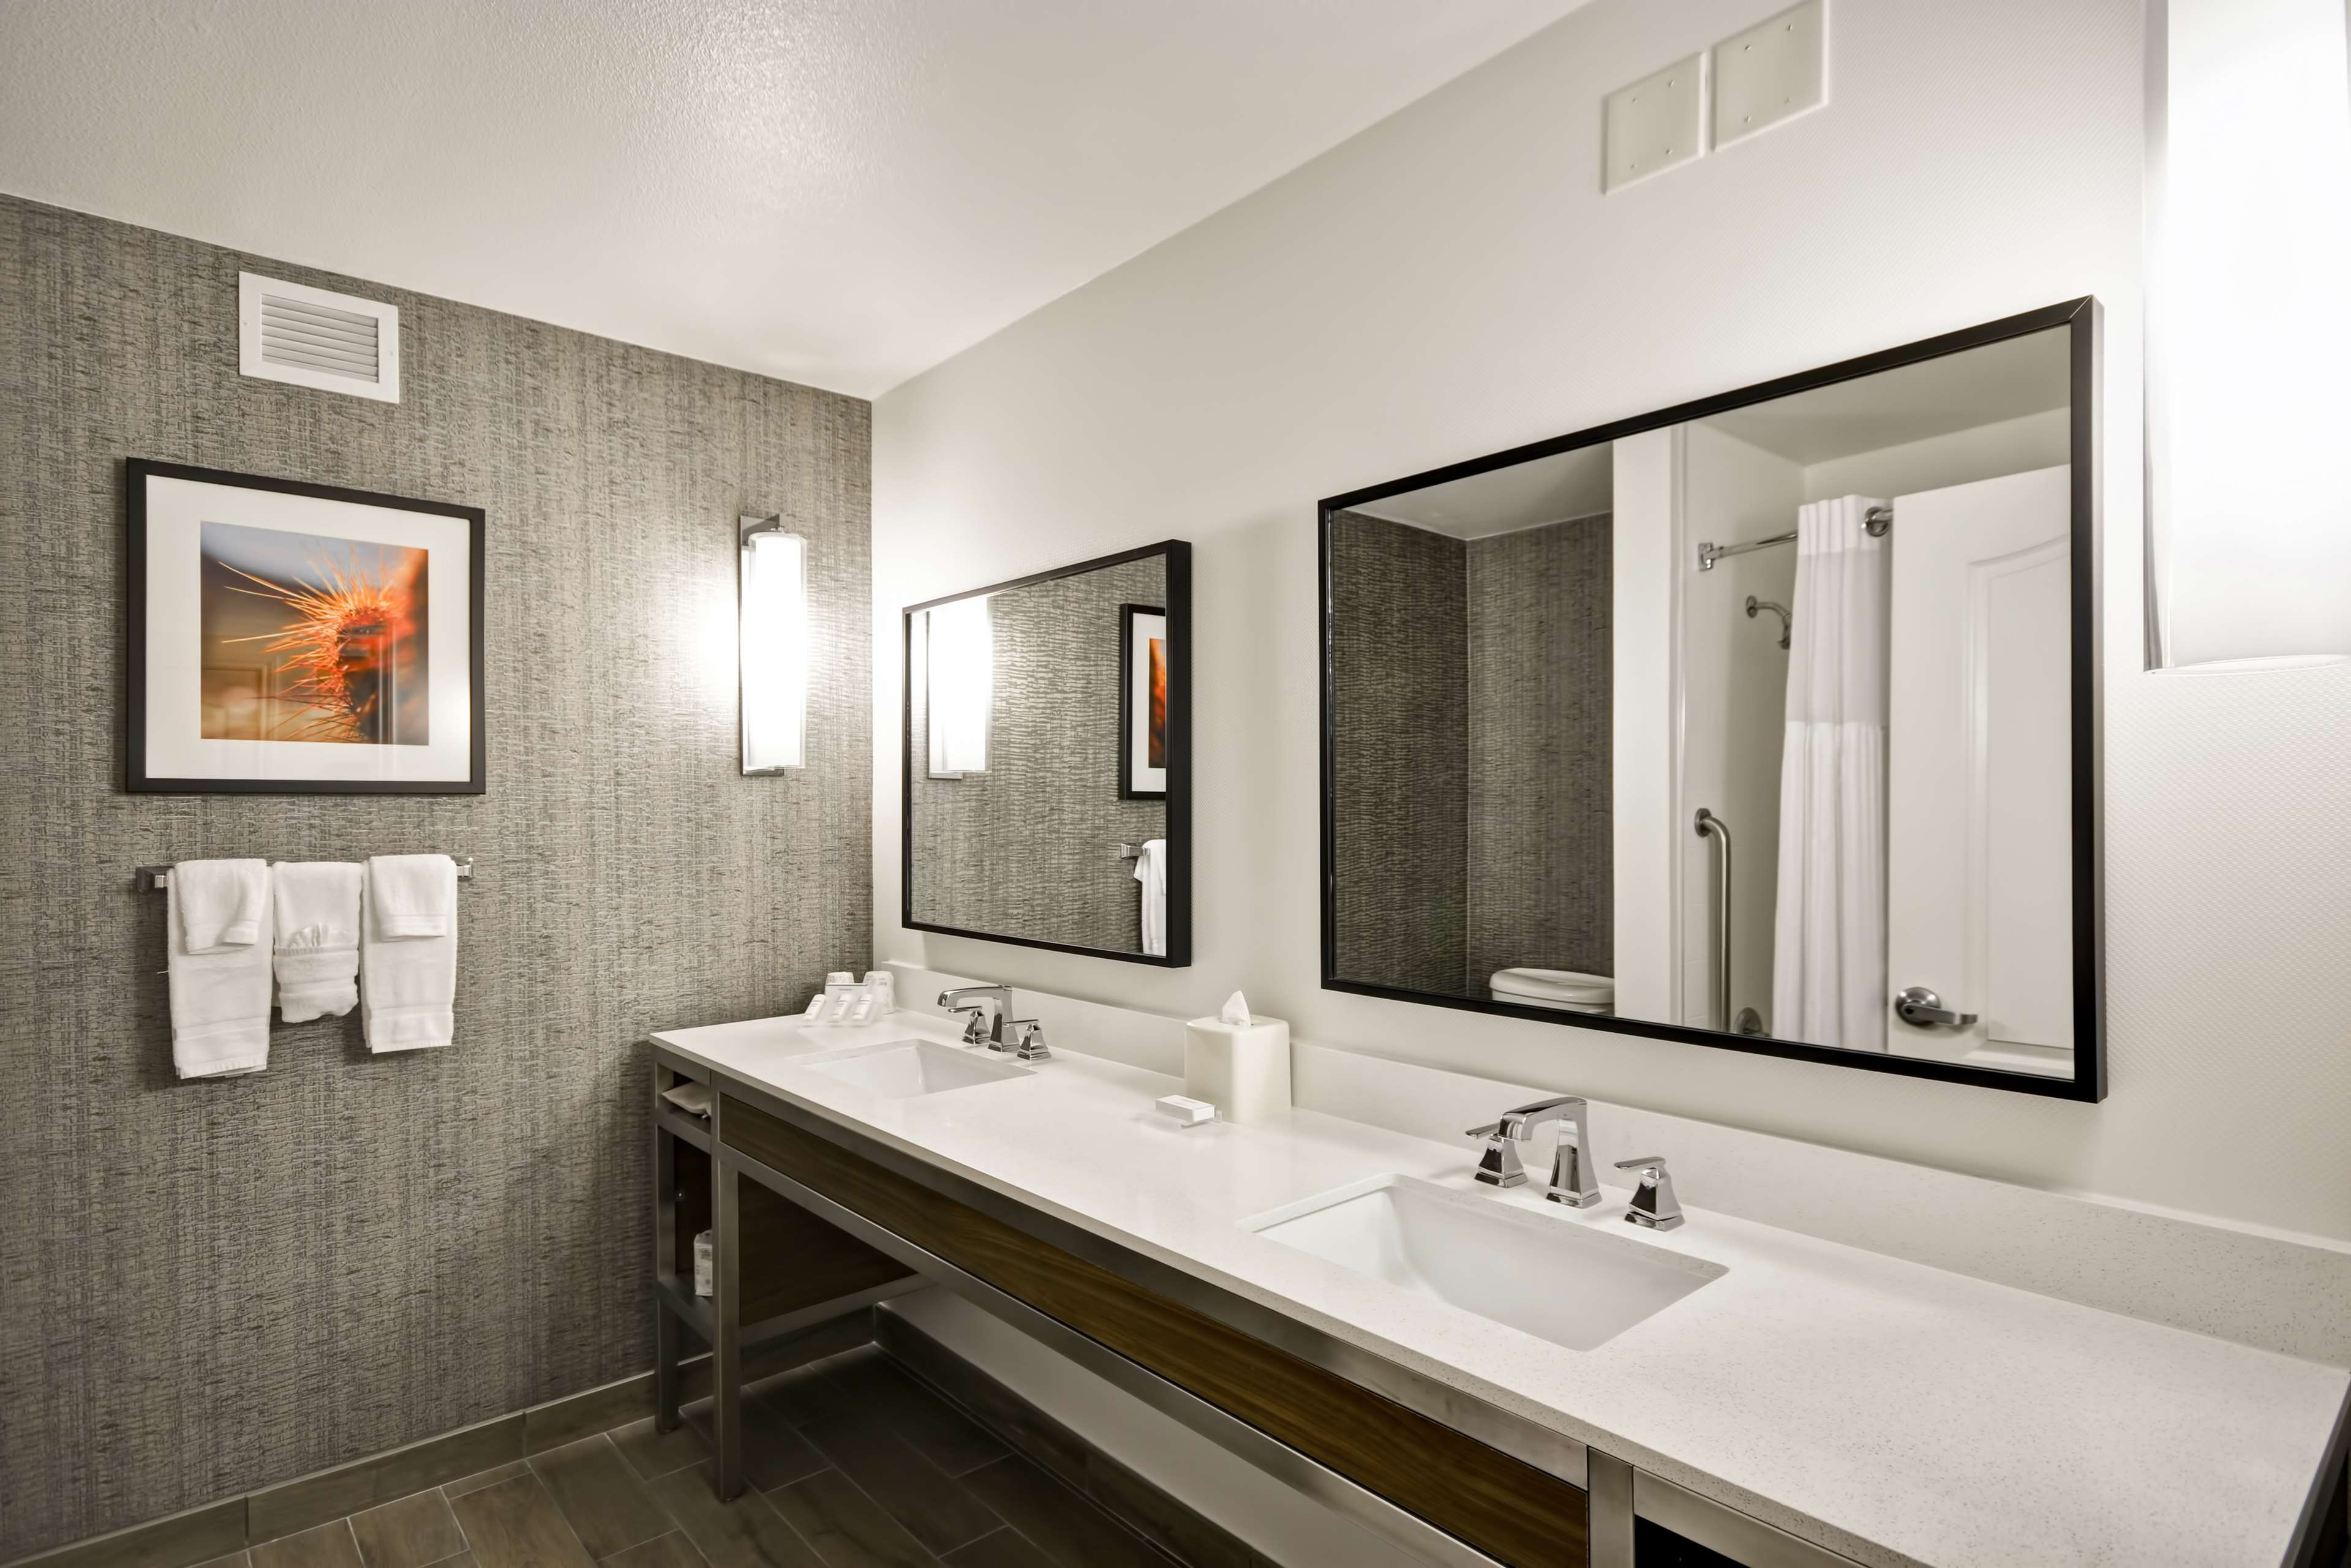 Hilton Garden Inn Austin/Round Rock image 29